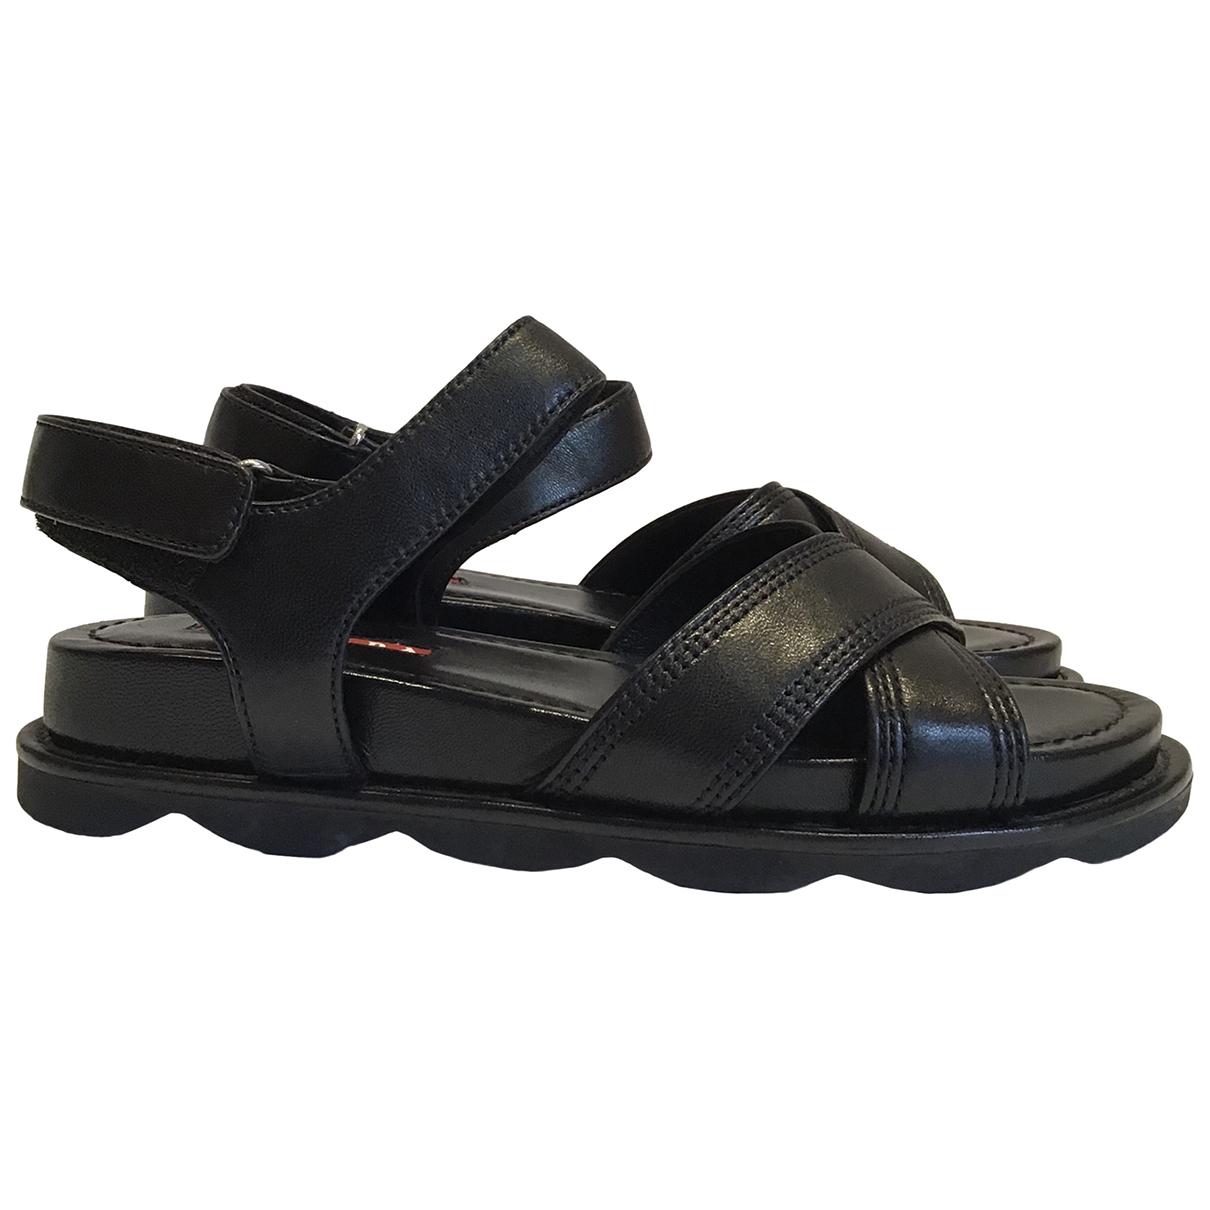 Prada N Black Leather Sandals for Women 36 EU